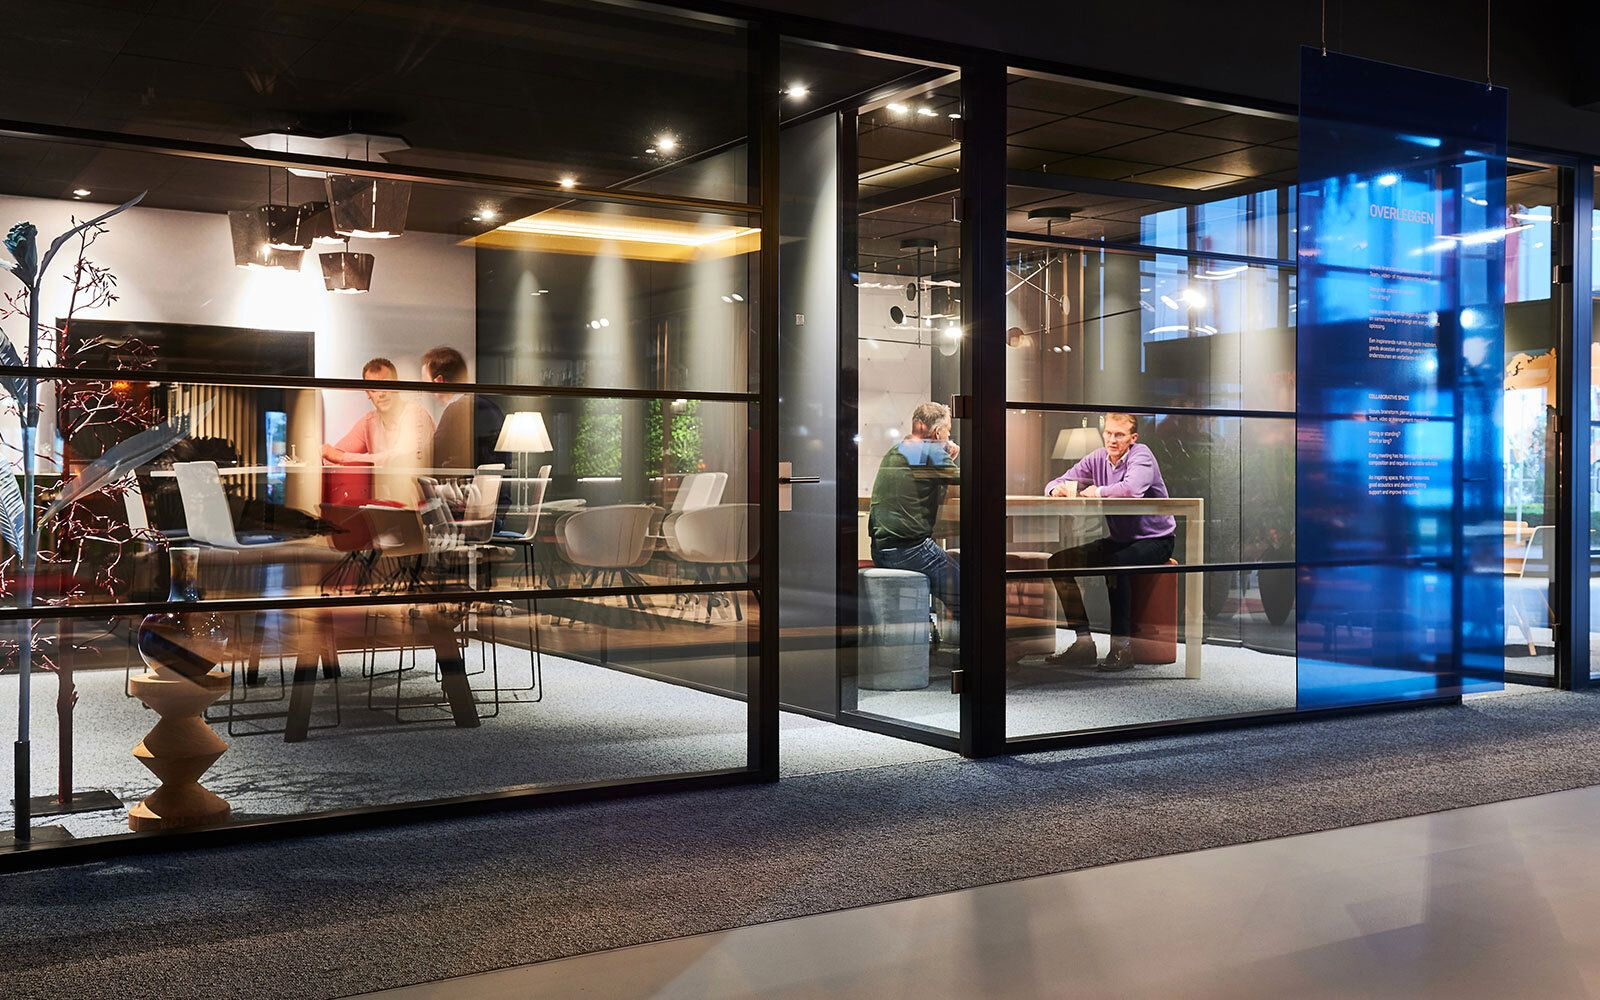 Vergaderruimte Interactief - Klantcase Vepa Office Furniture (Interactief)